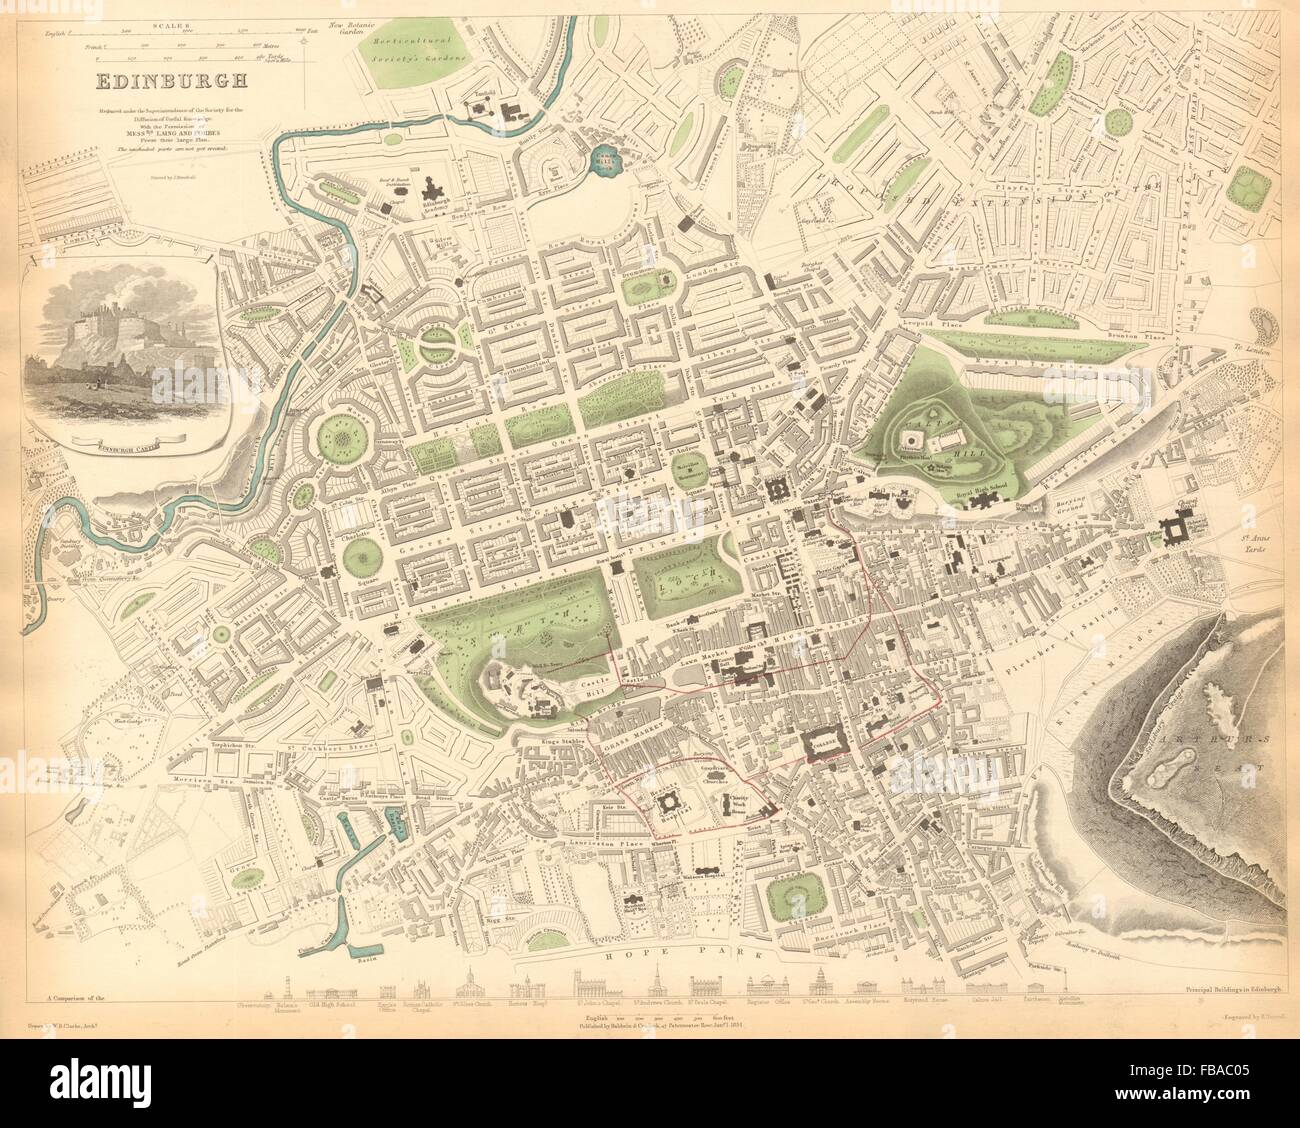 EDINBURGH. Antique town city map plan. Key buildings profiles. SDUK, 1844 Stock Photo